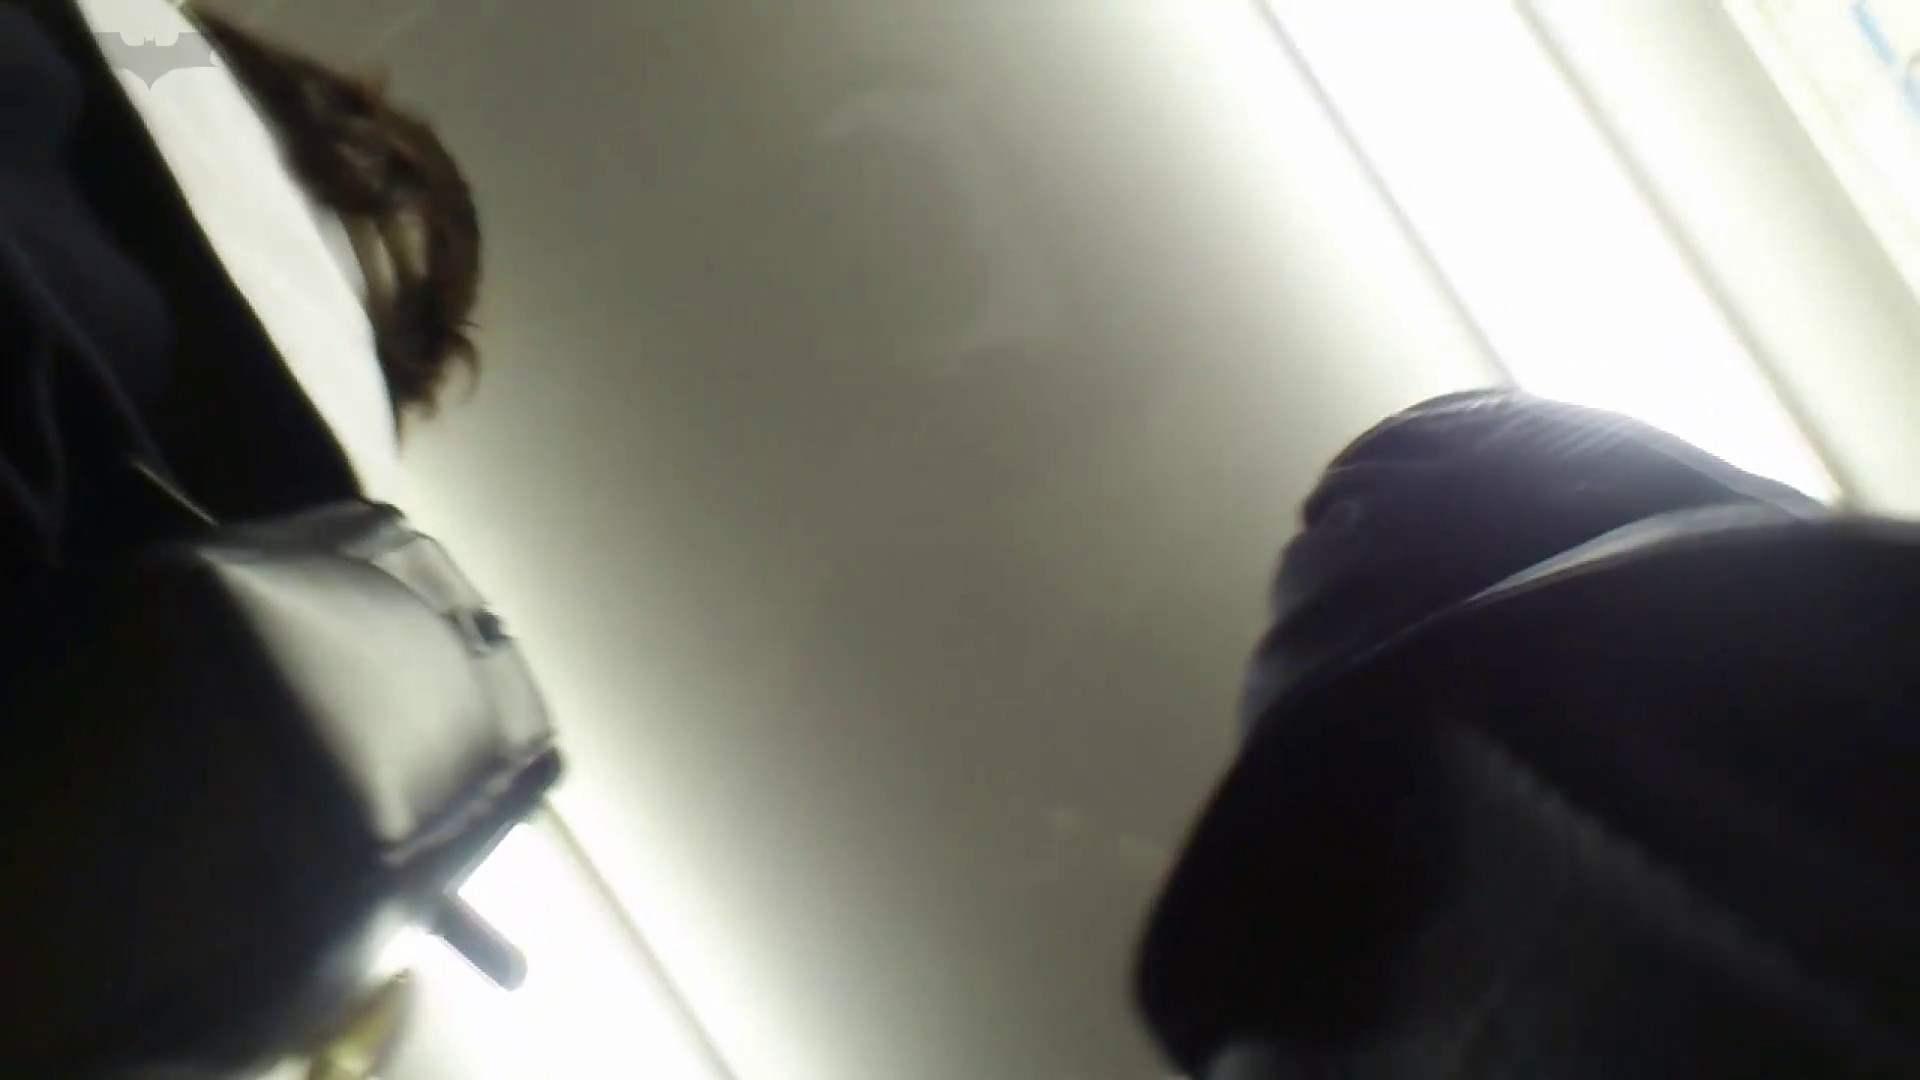 盗撮列車 Vol.50 制月反姿の妄想 OL女体 エロ無料画像 67連発 47